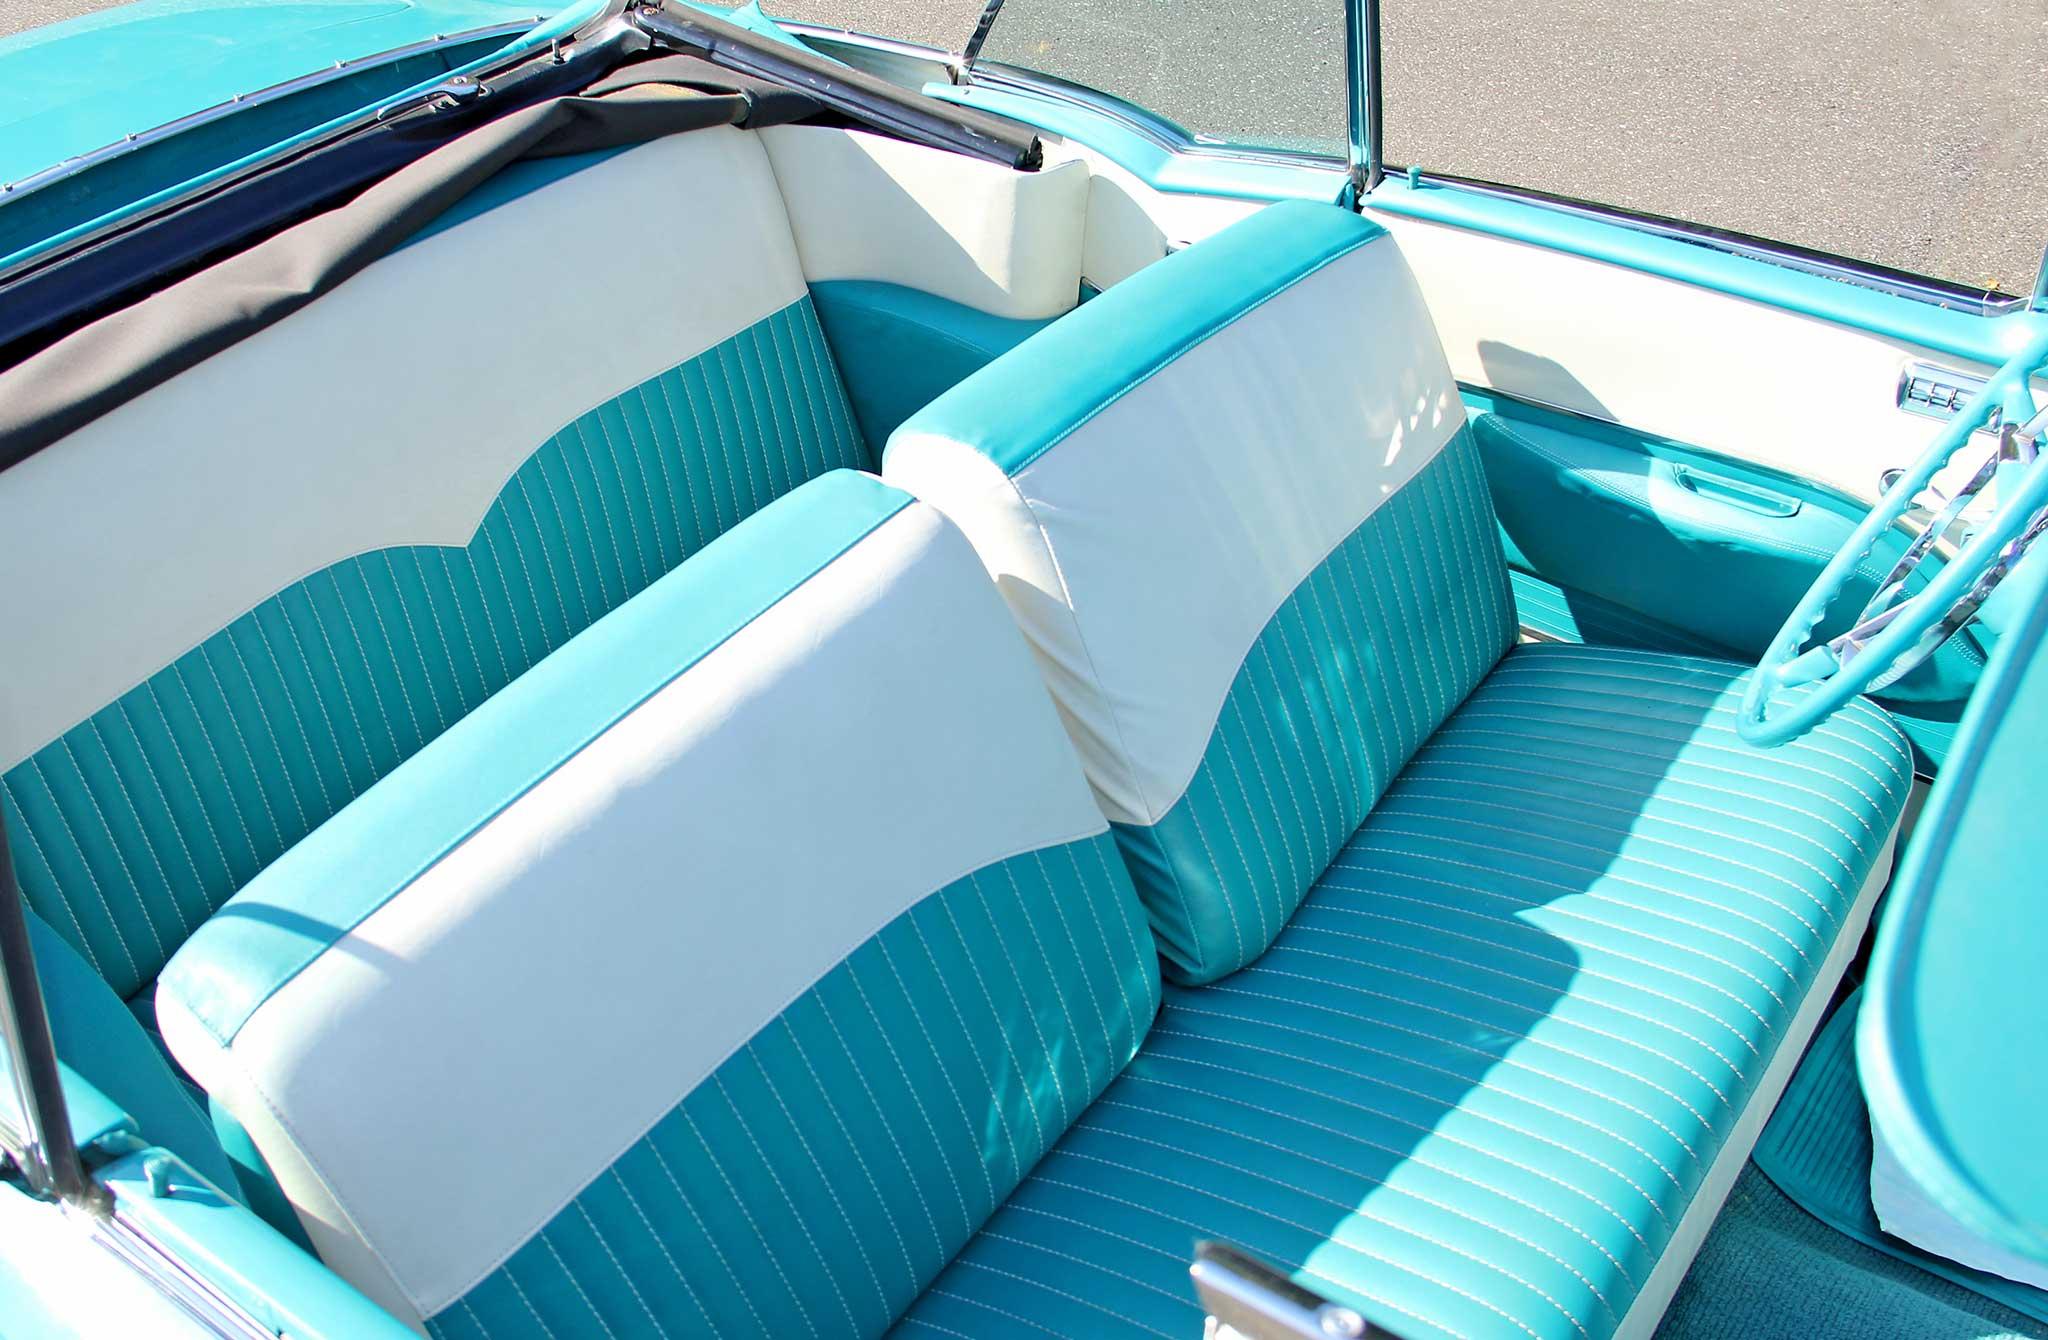 Terrific 1955 Chevy Bel Air Convertible American Classic In Japan Beutiful Home Inspiration Semekurdistantinfo